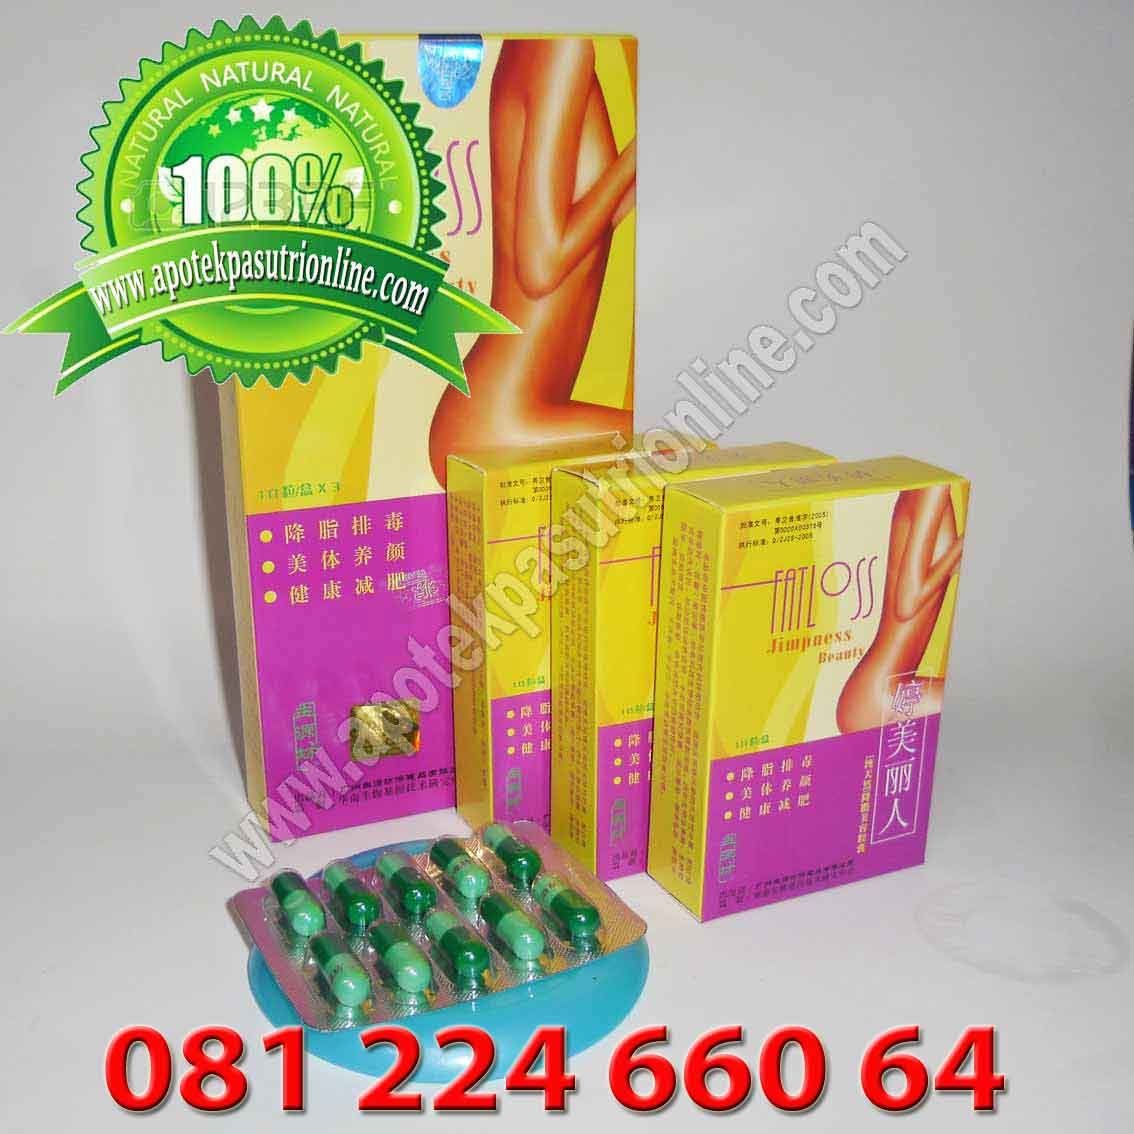 Delivery Order Pelangsing badan Fatloss Asli Di bandung  f0cba09052